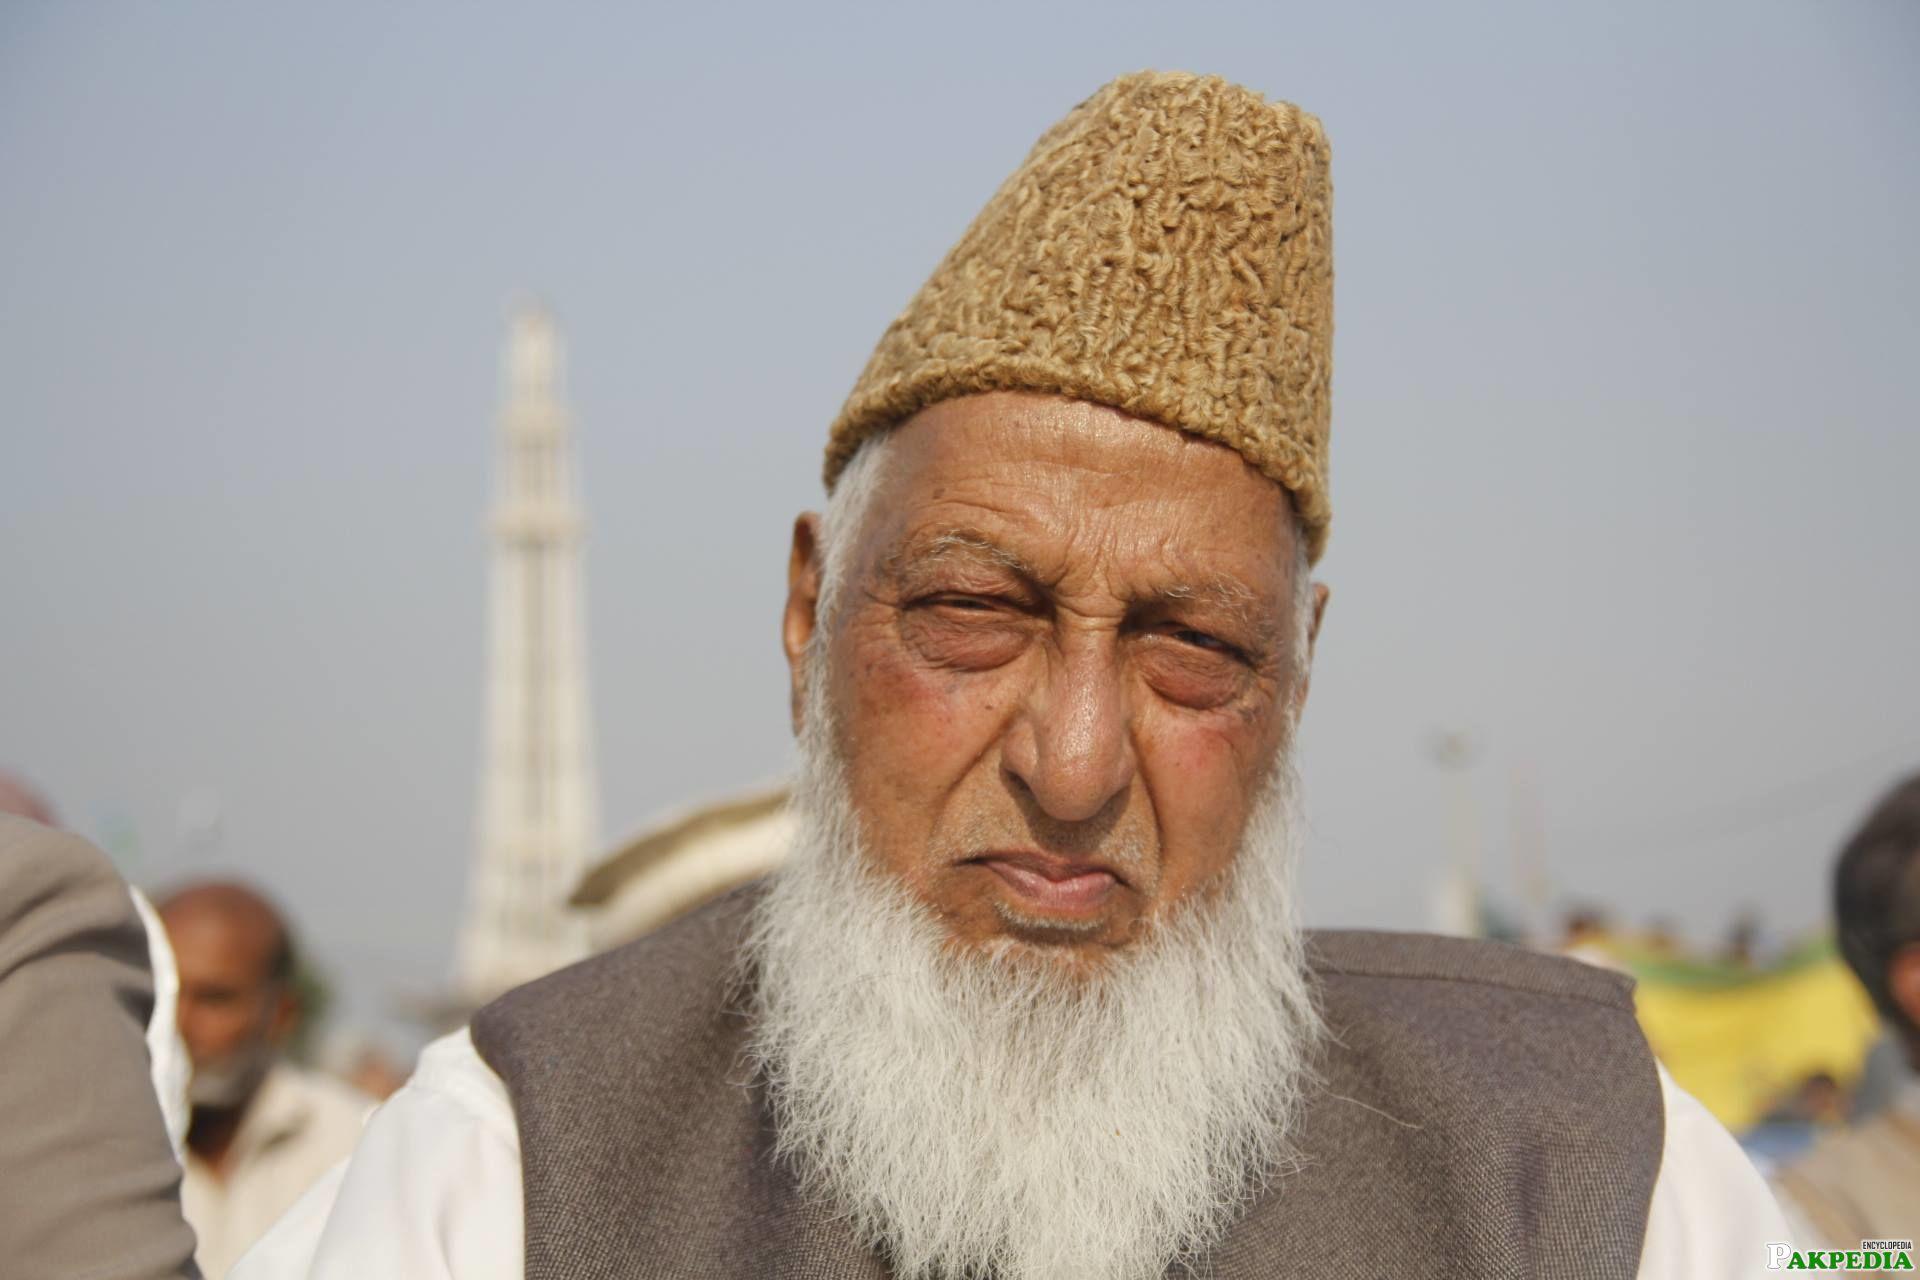 Naimatullah Khan at Minar-e-Pakistan in Jalsa